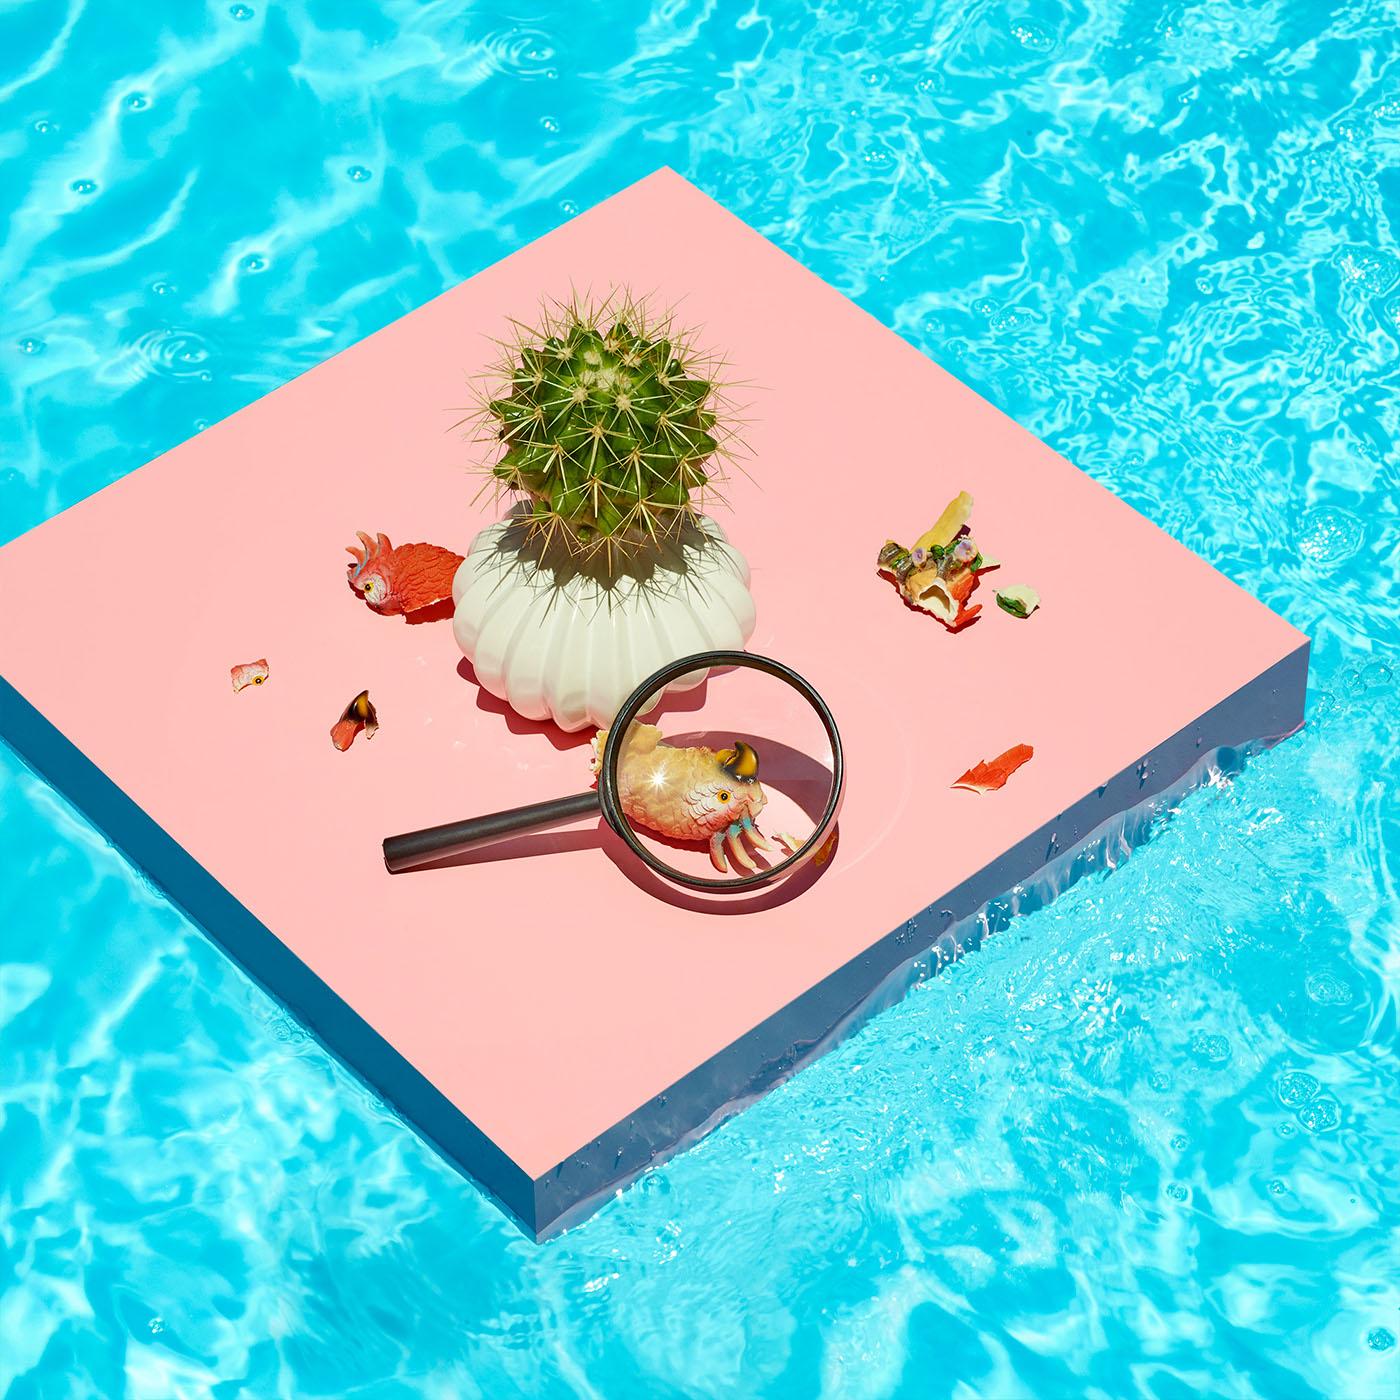 Heat Wave - Paloma Rincon